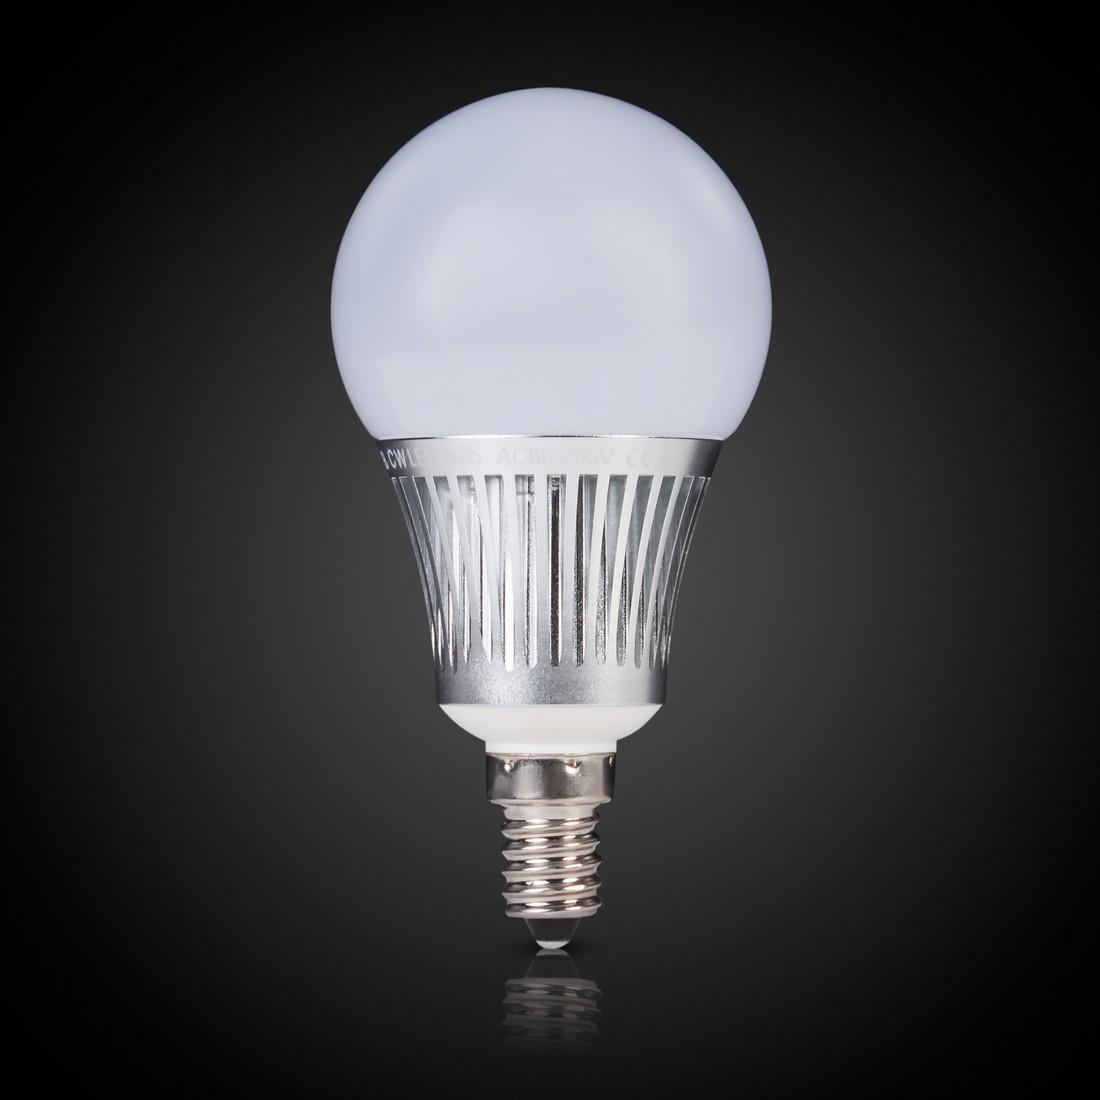 Светодиодная лампа SMART RGBW лампочка Milight FUT013С